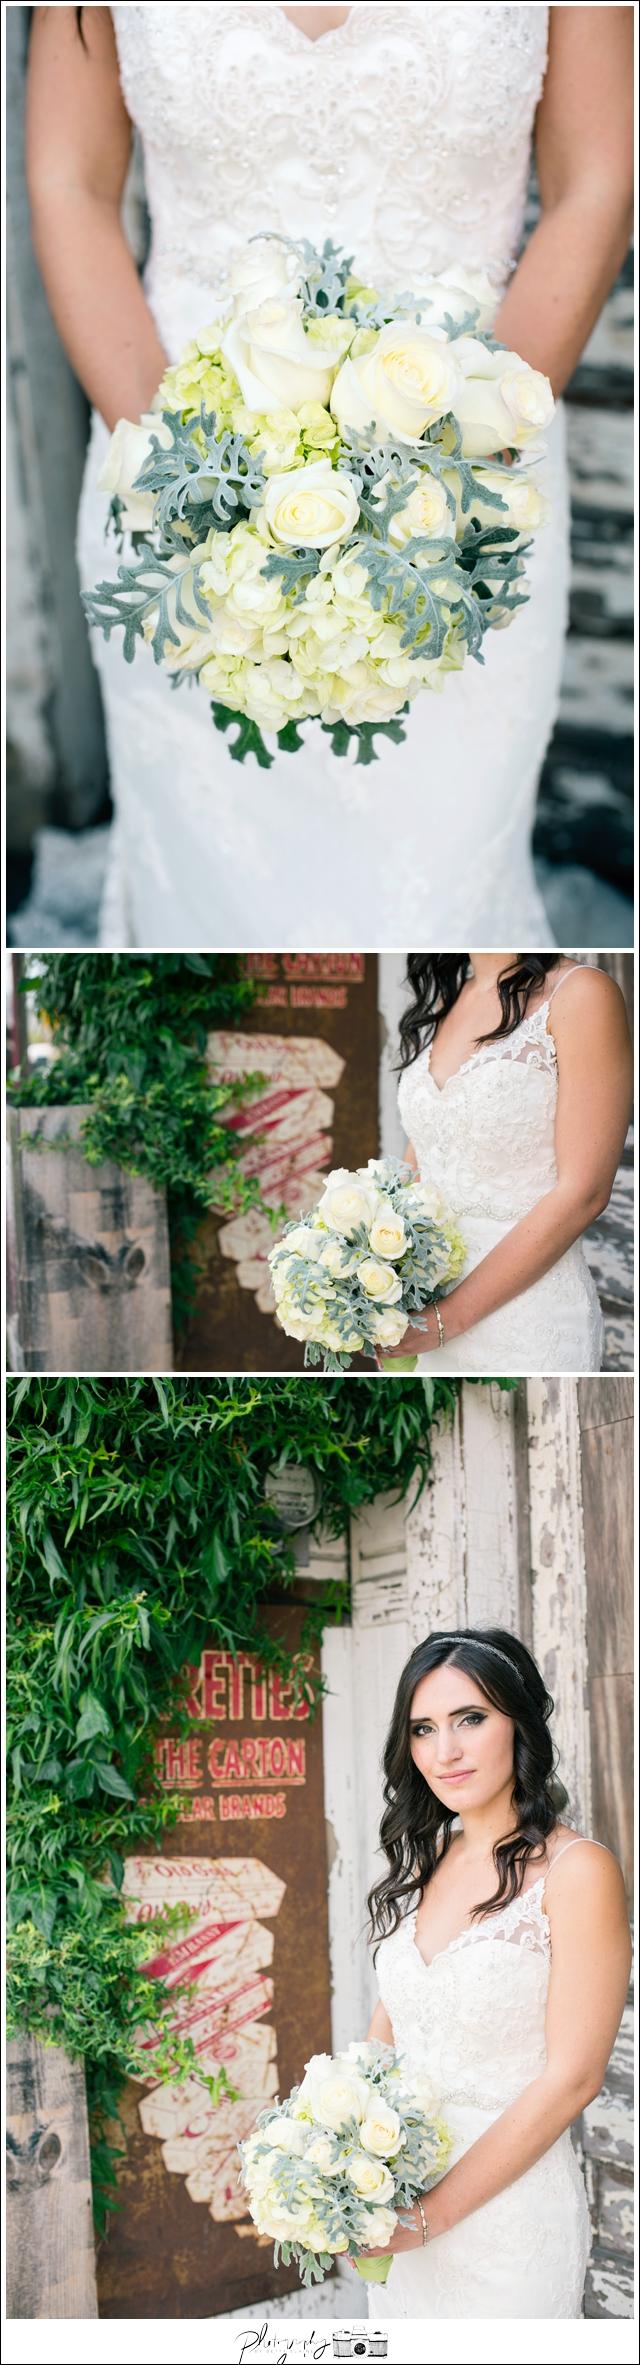 13-Bridal-Portraits-Wedding-Bouquet-Snohomish-Historic-Downtown-Wedding-Photography-by-Betty-Elaine-Seattle-Wedding-Photographer